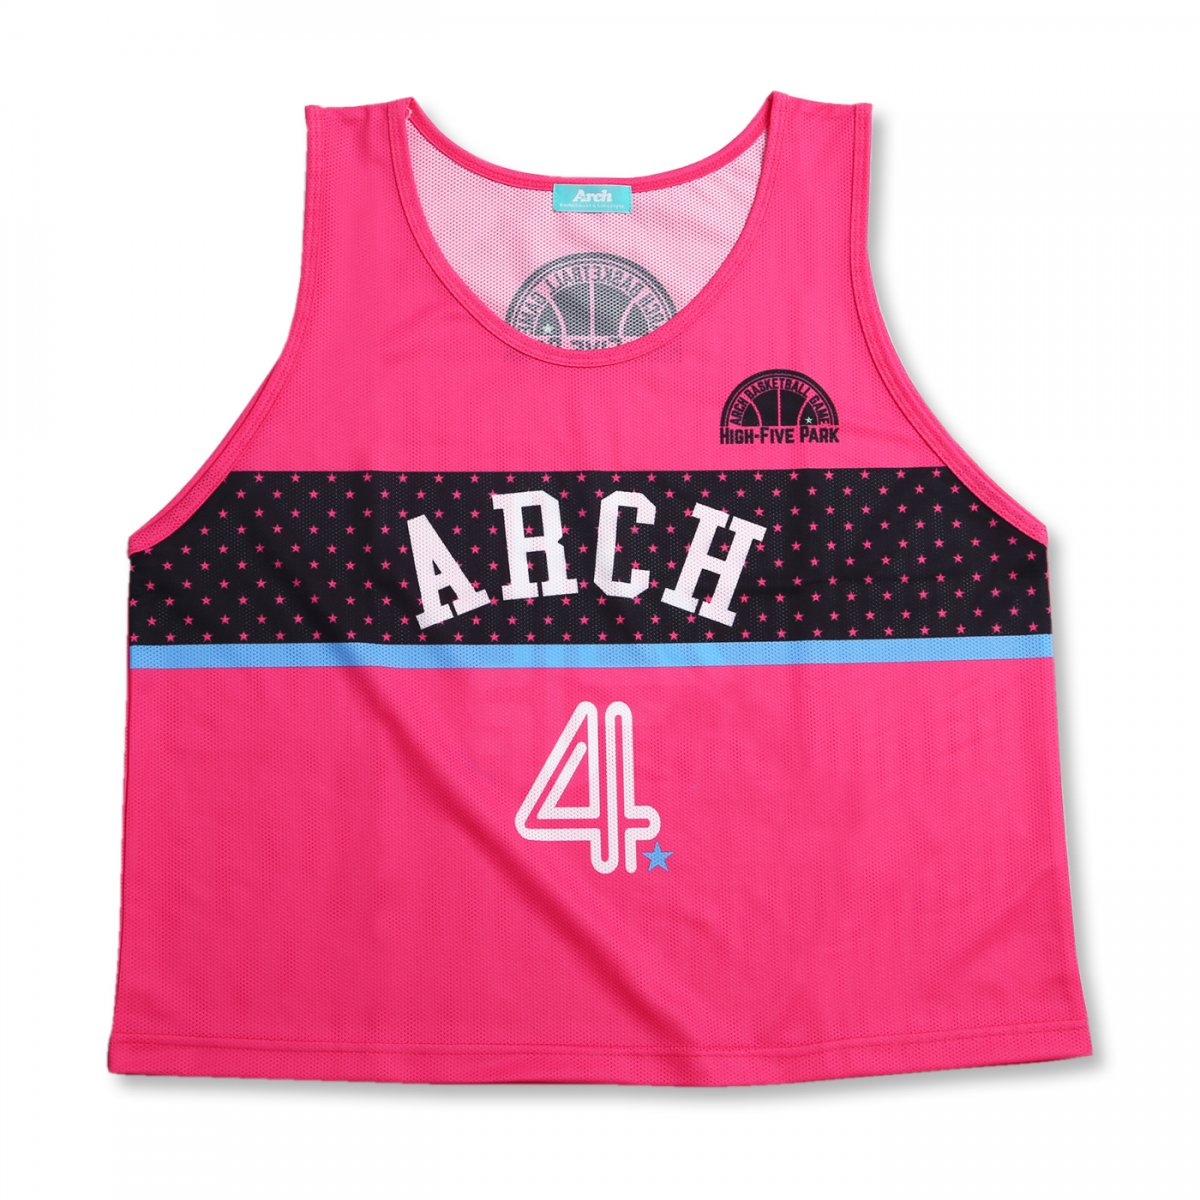 HIGH-FIVE PARK game bibs【pink】(10枚set)